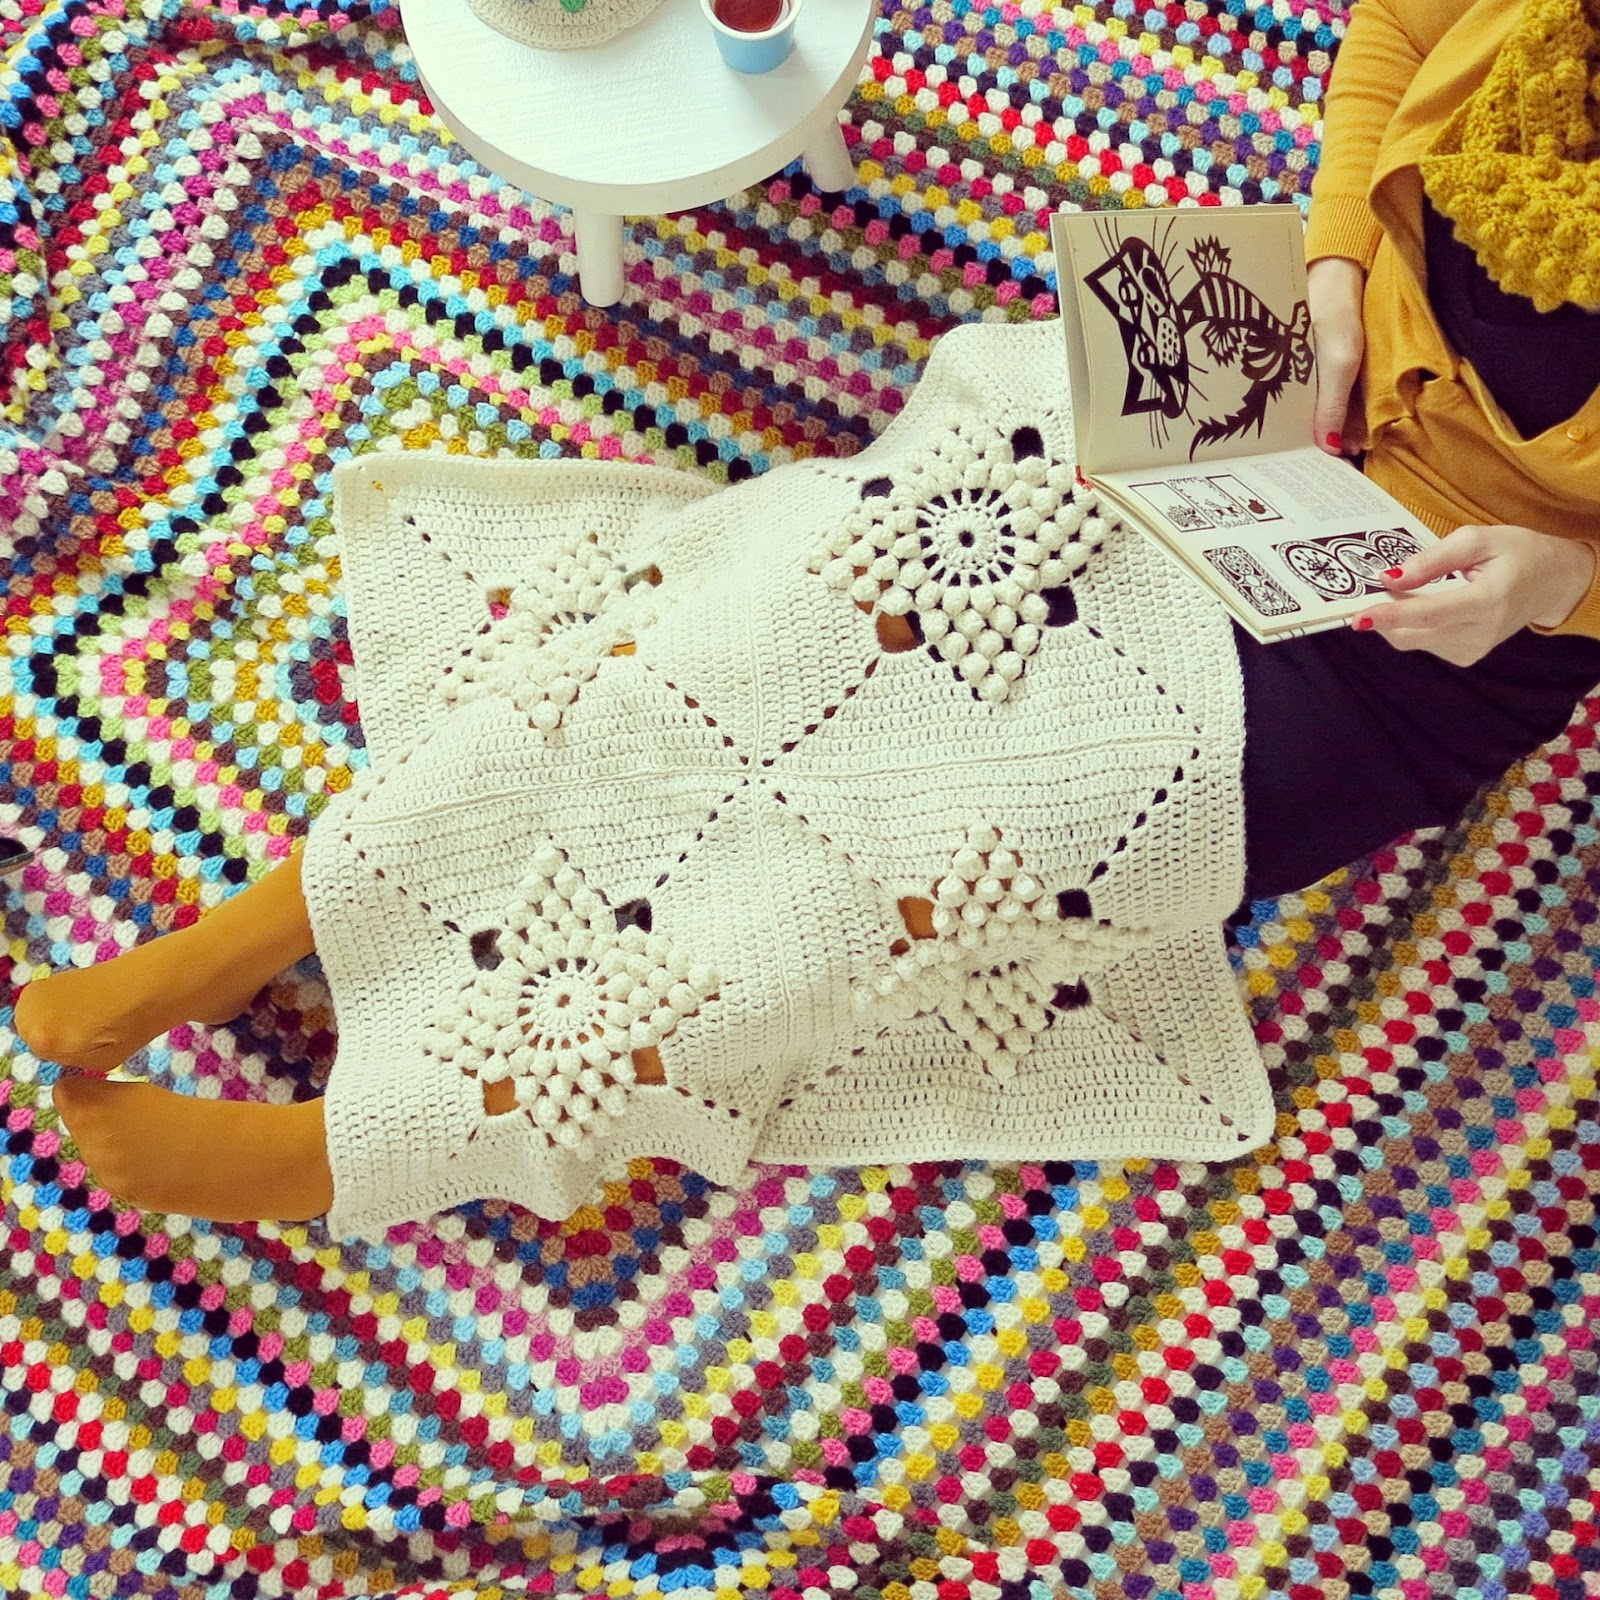 crochet granny square diagram 8 ohm wiring ergahandmade blanket 43 diagrams free pattern